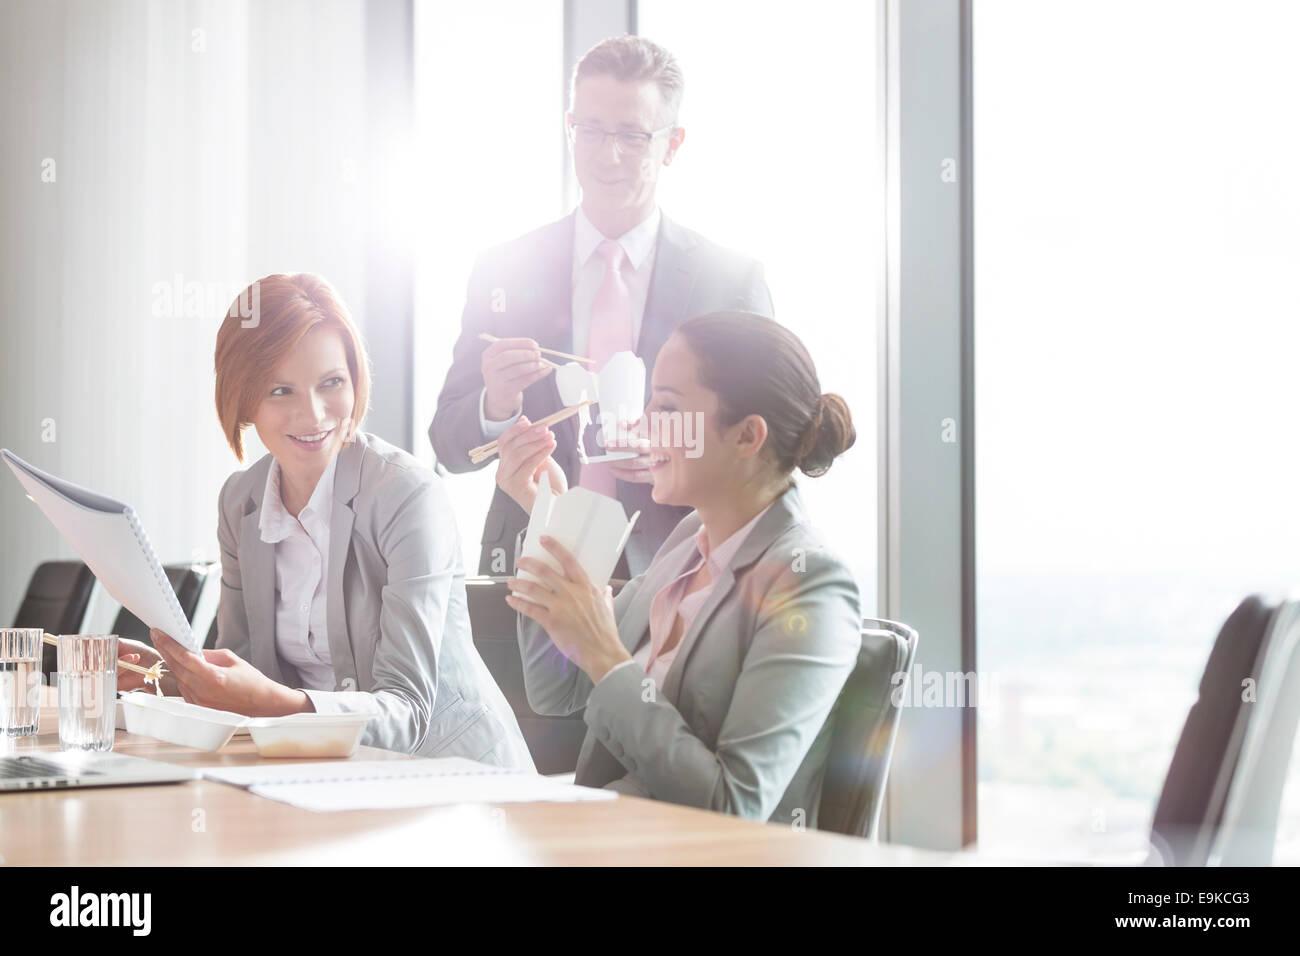 Geschäftsleute mit Mittagspause Stockbild